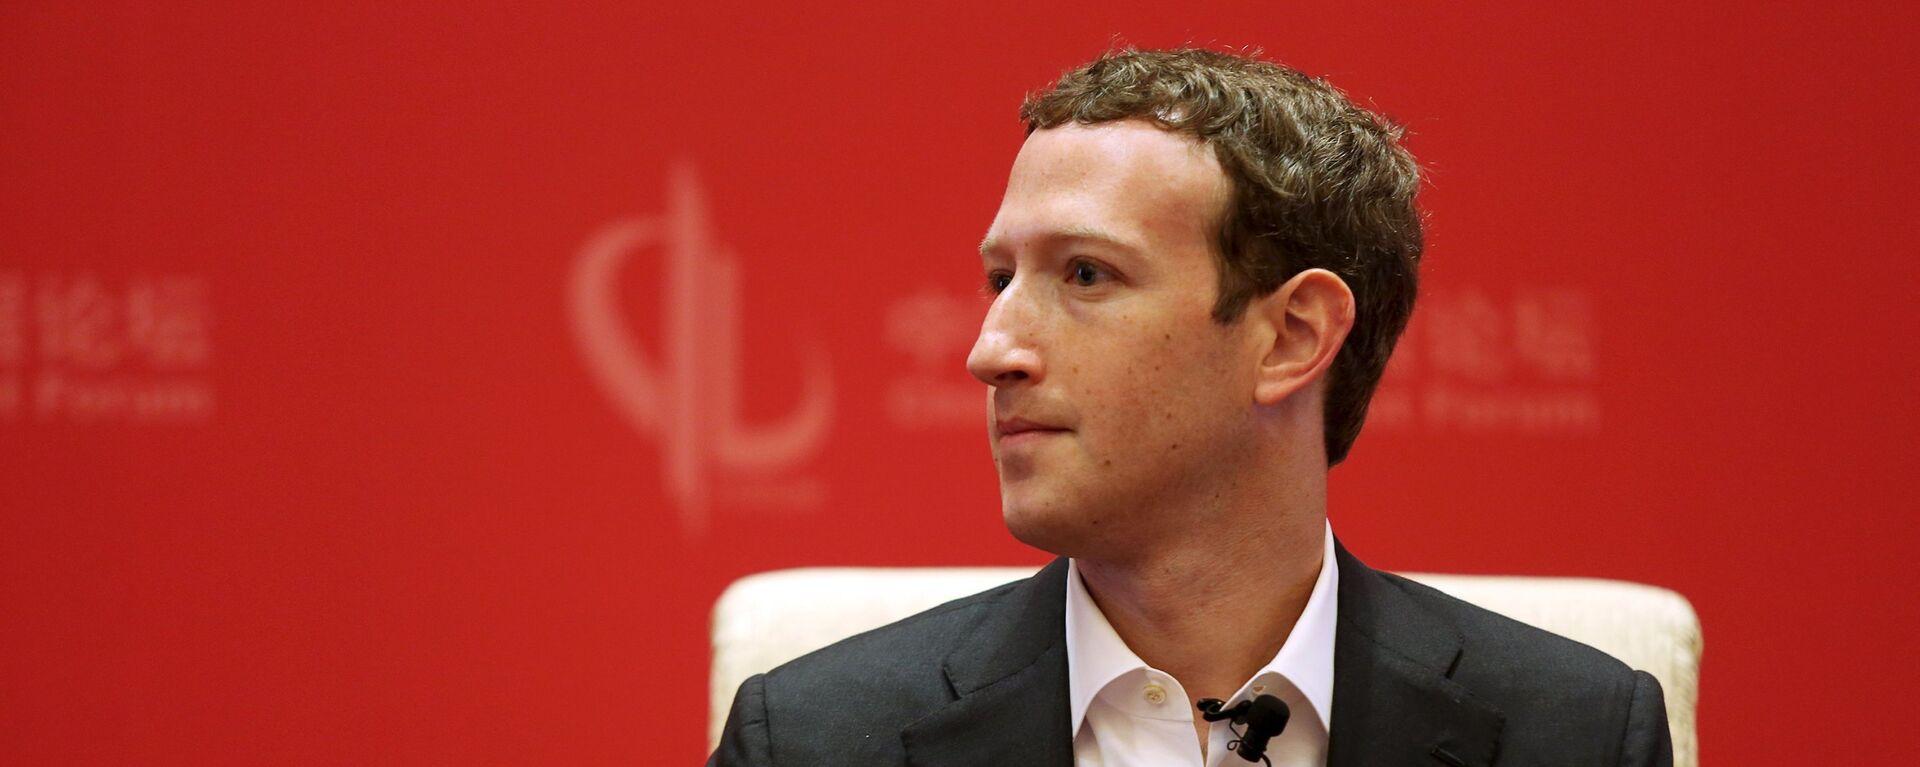 Mark Zuckerberg - Sputnik Česká republika, 1920, 10.04.2021